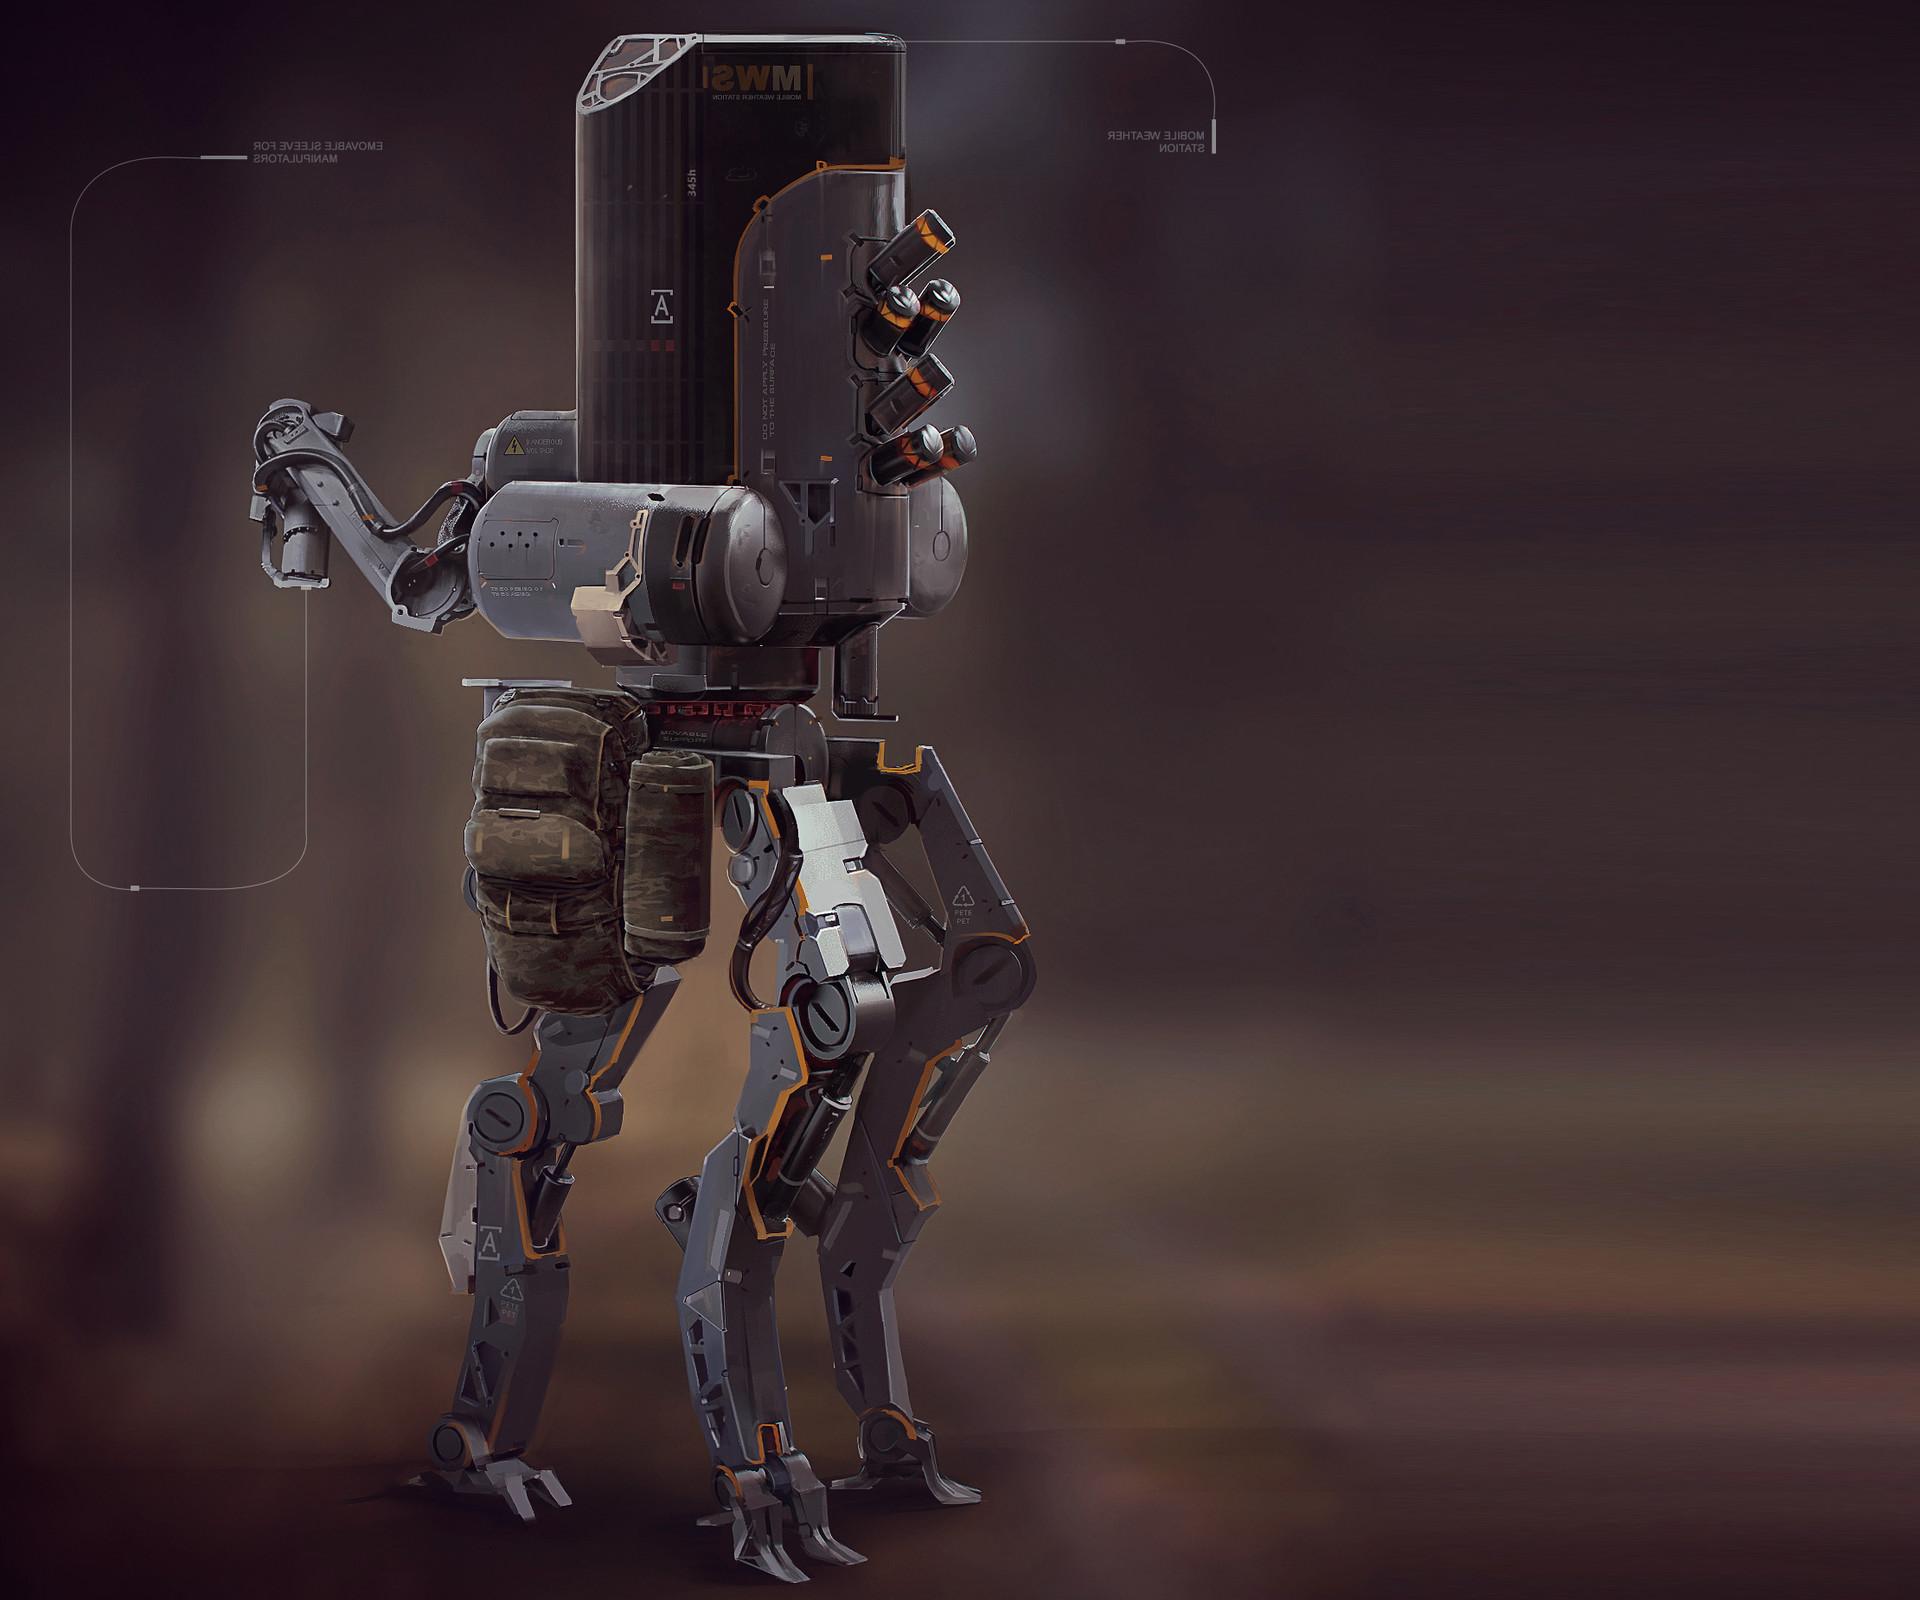 Yuriy romanyk tripod 3drobot characterdisigne concept